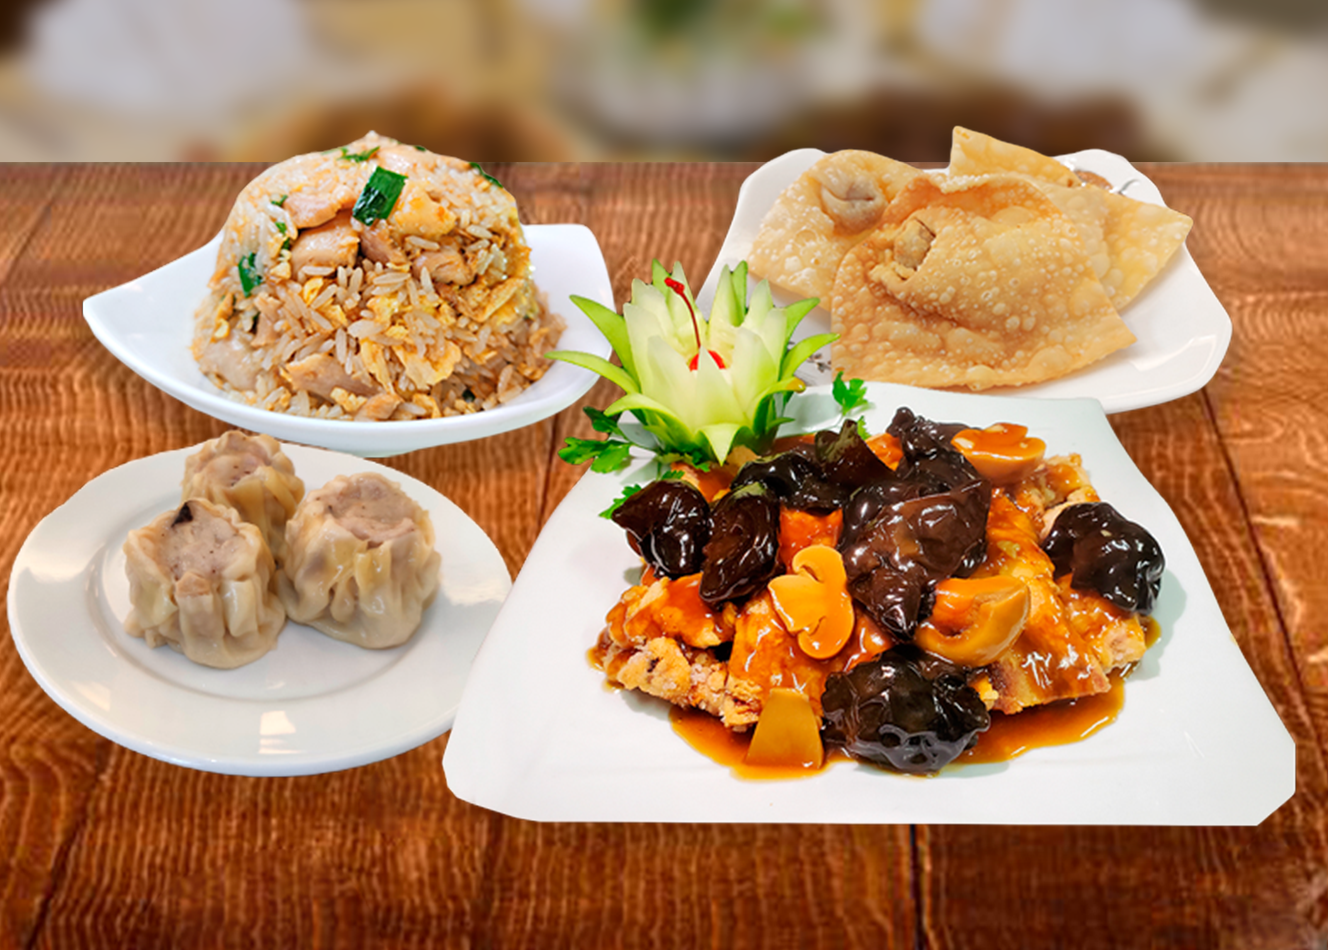 ** Para 2 - 3 personas **  - 03 Siumay  - 03 Wantán  - Pollo Chijaukay o Pollo Tipakay  - Carne de res salteado con verduras  - Arroz chaufa de Pollo